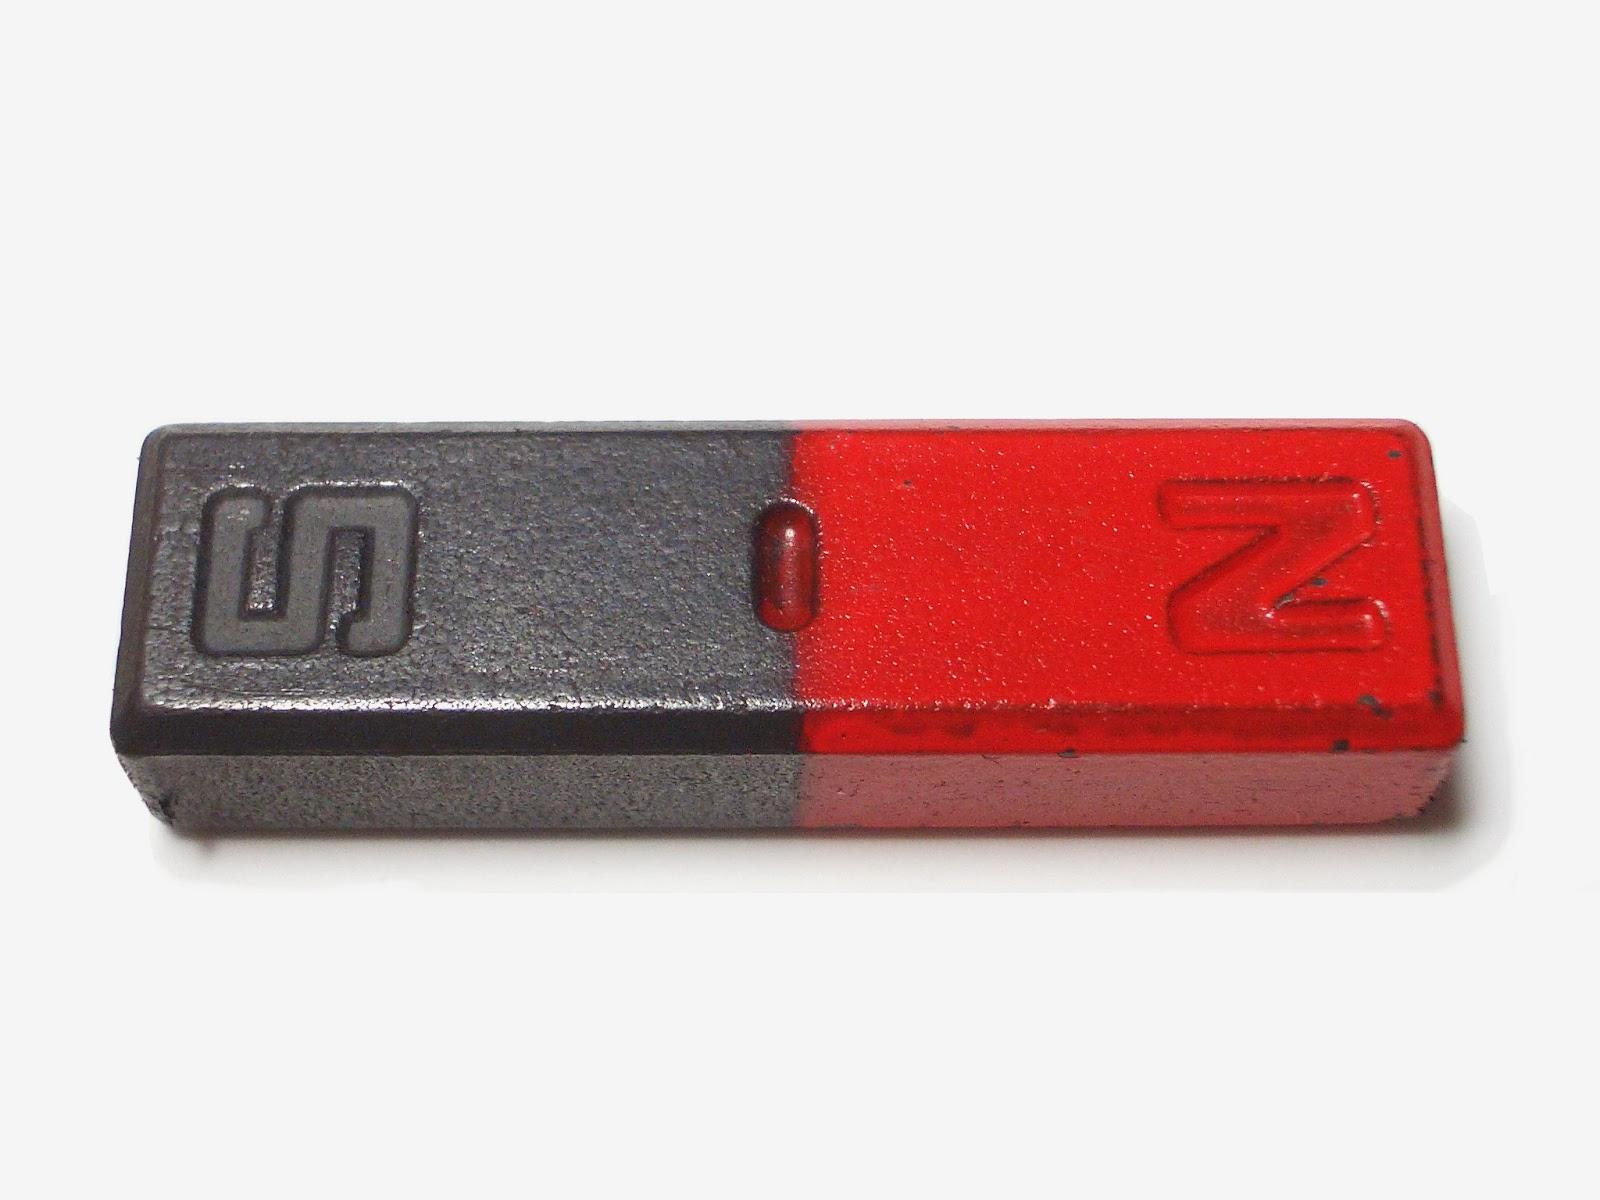 neodymium magnet rare earth magnet ferrite magnet strong magnet magnet. Black Bedroom Furniture Sets. Home Design Ideas